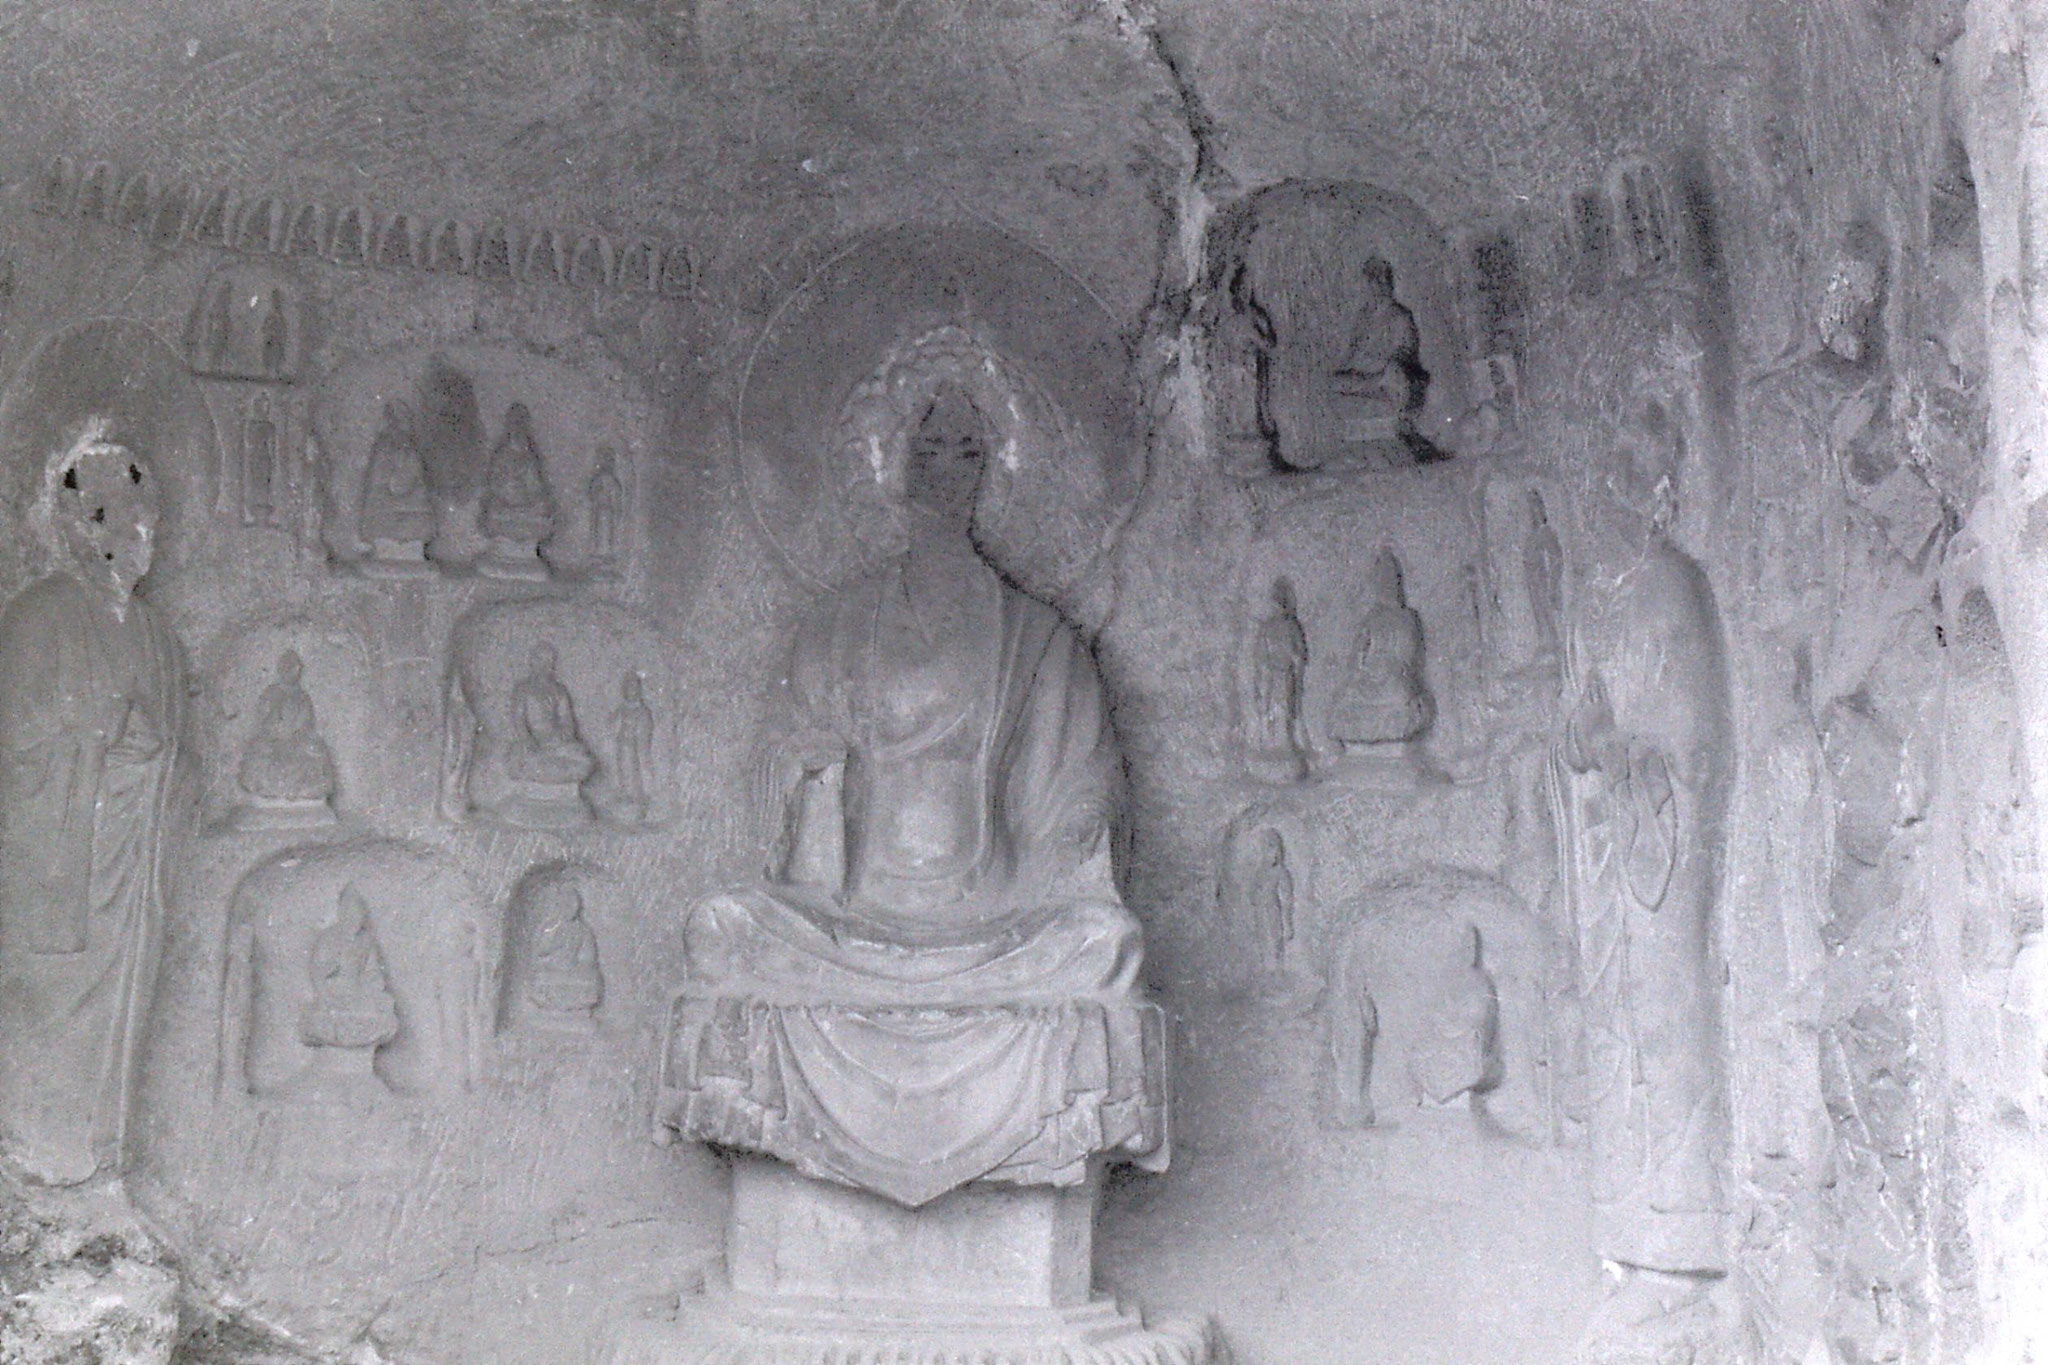 28/2/1989: 7: Luoyang Longmen Caves alcove